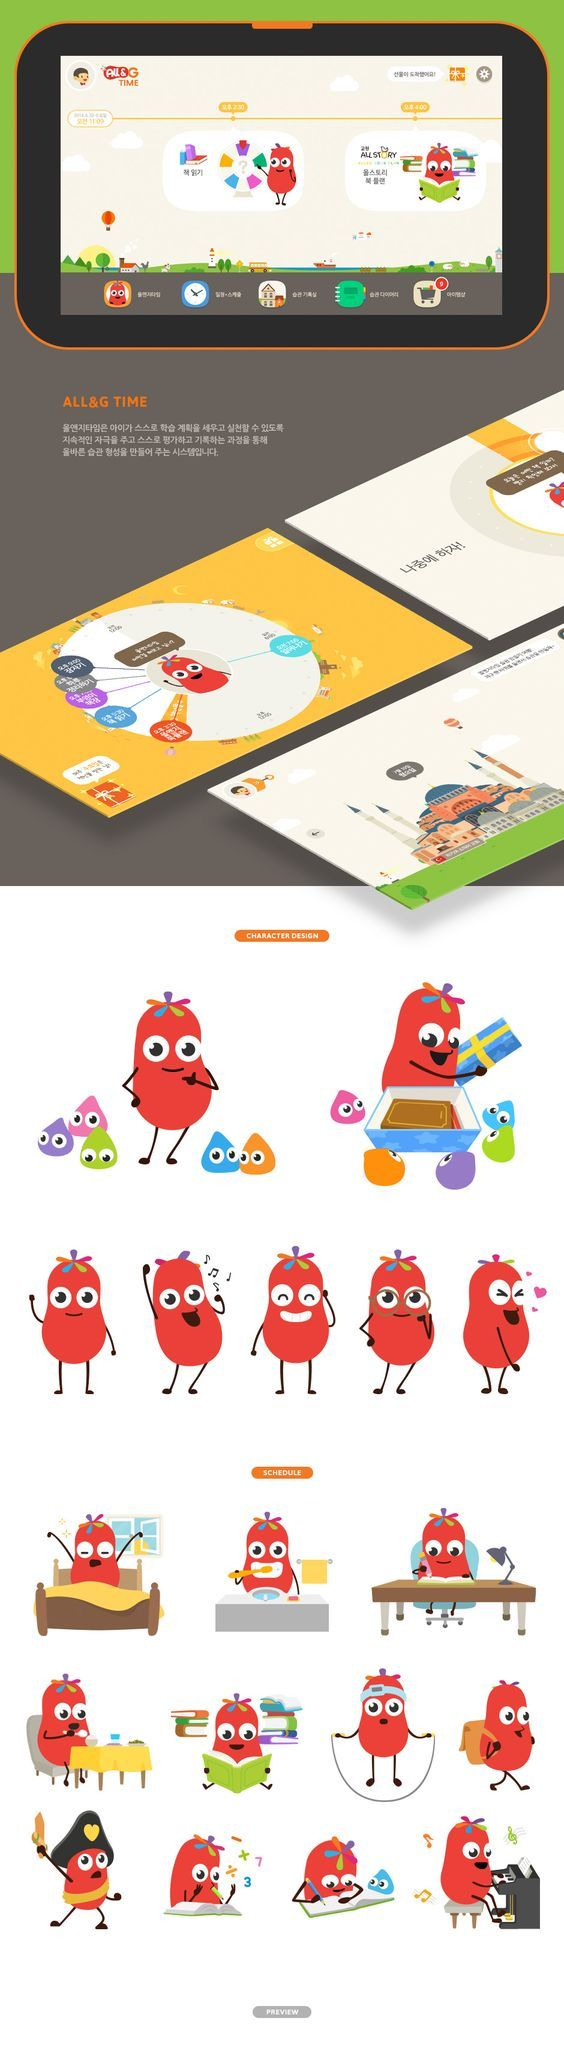 Character Design Appeal : Best game design images on pinterest